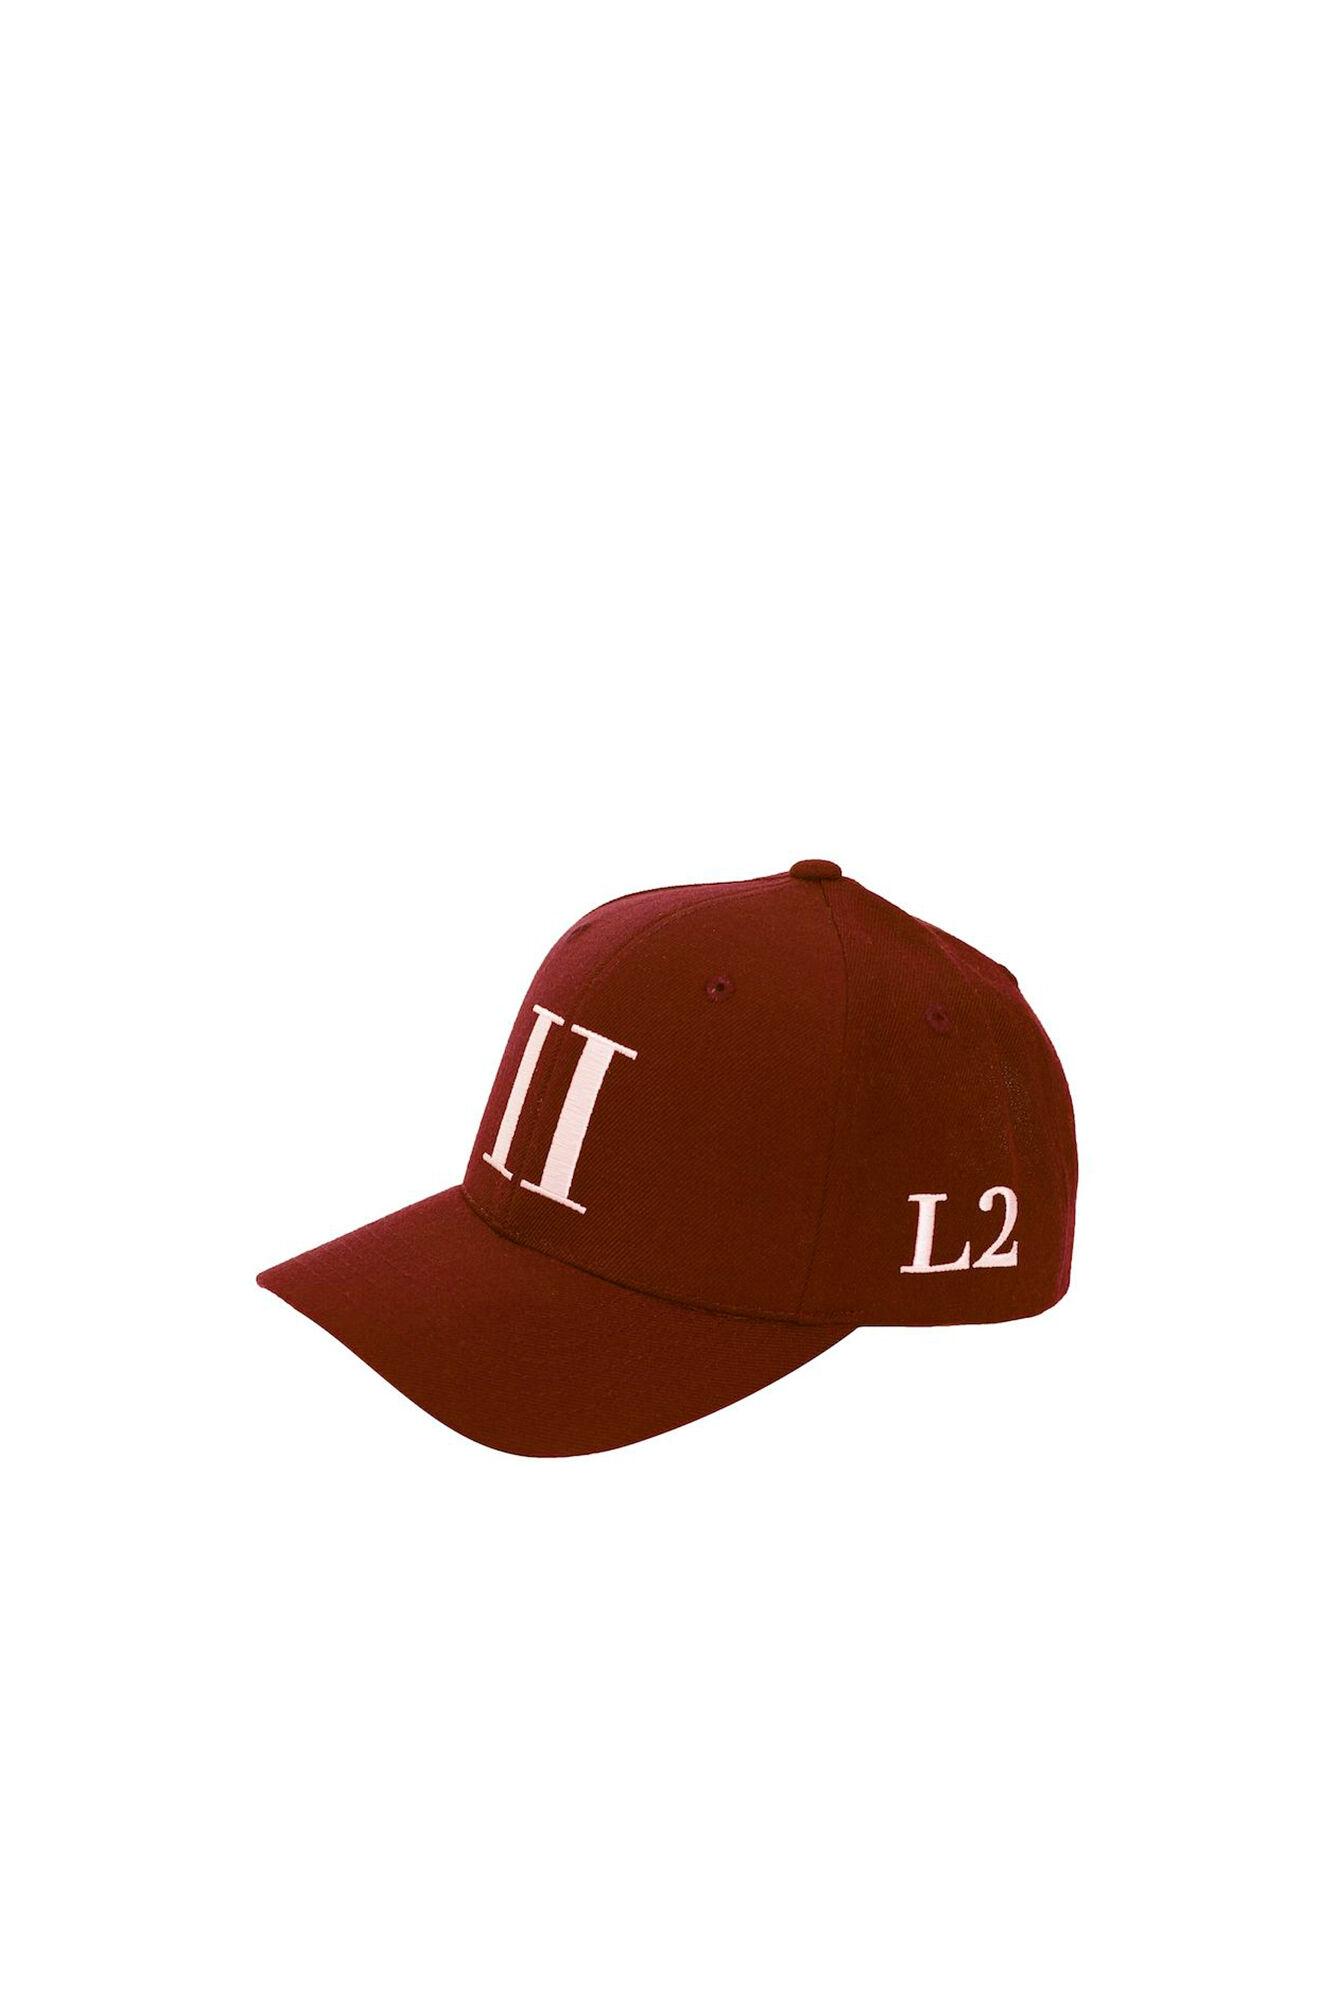 Baseball cap II LDM702002, BORDEAUX